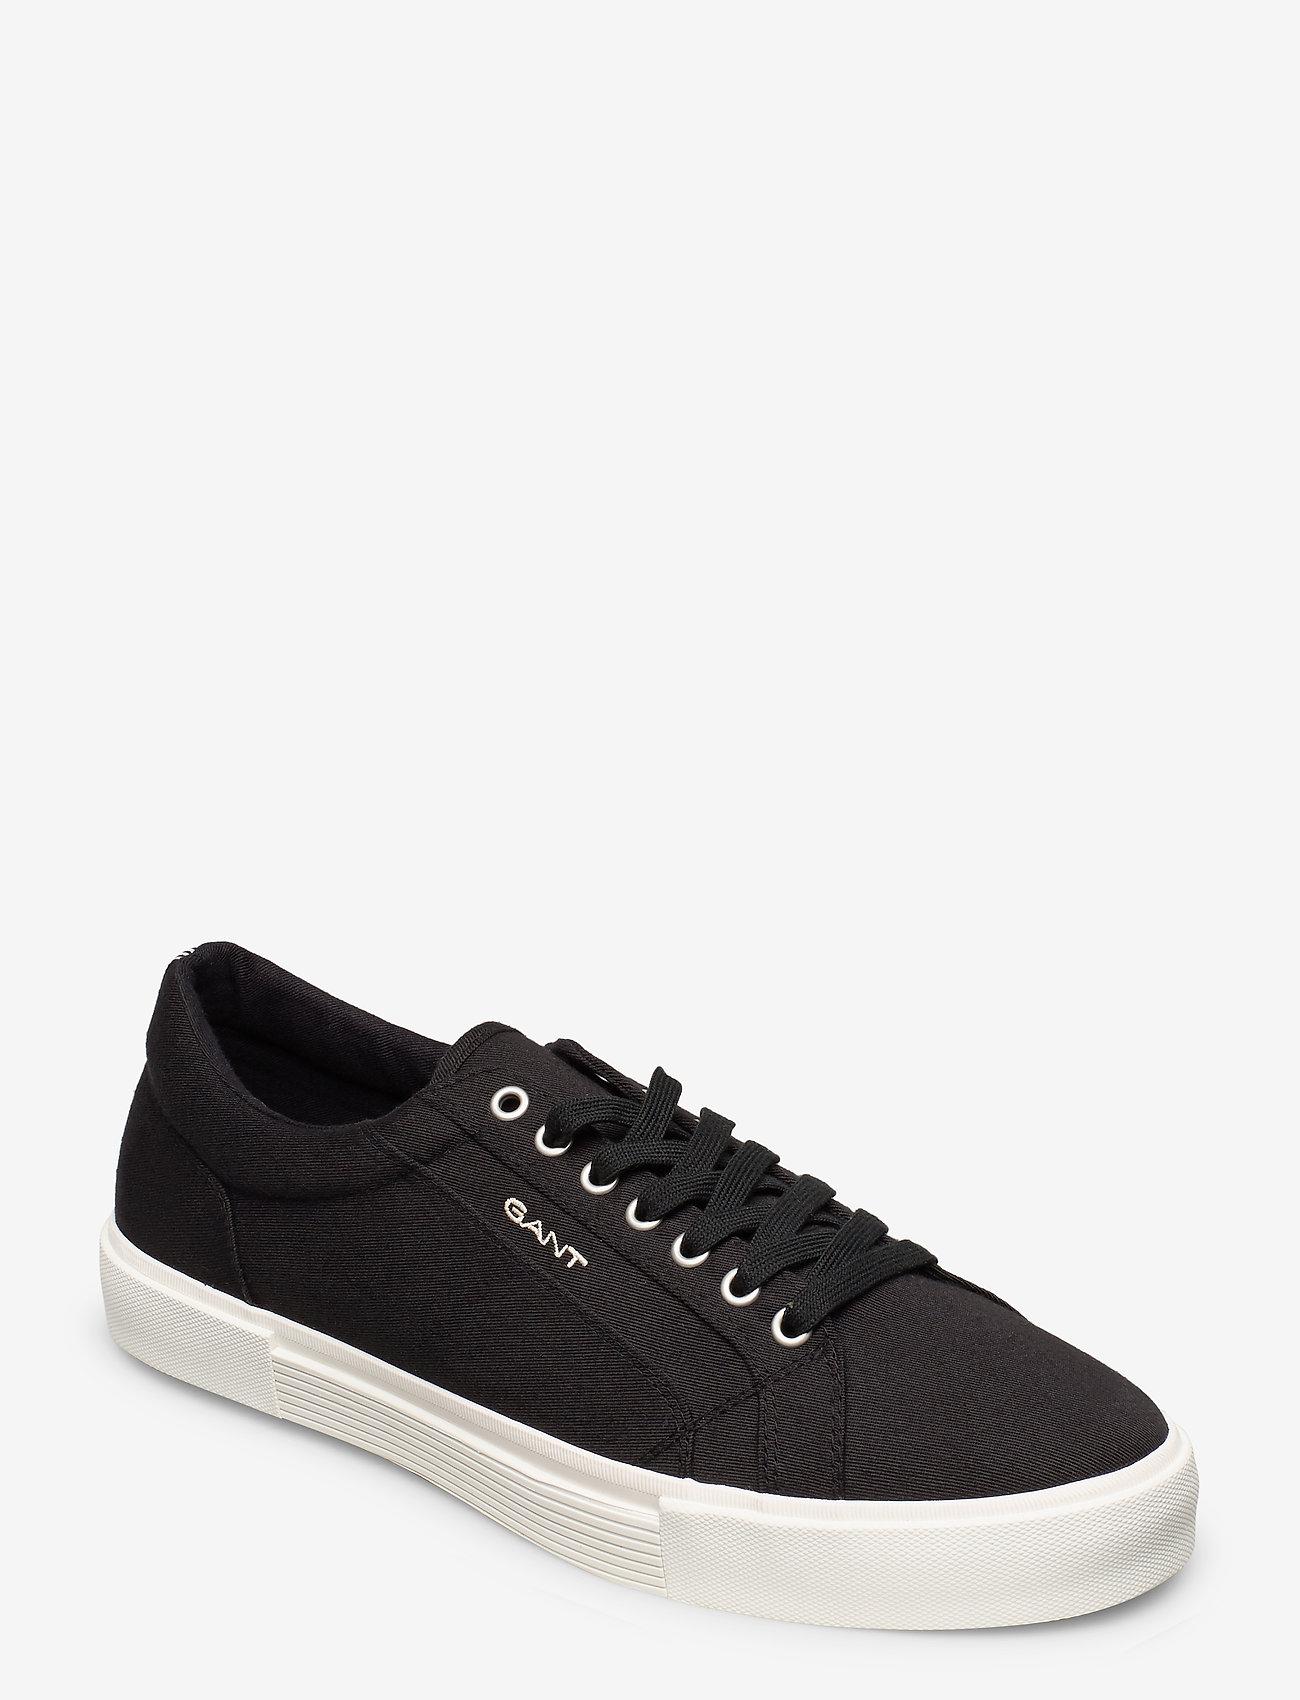 GANT - Champroyal Low laceshoes - low tops - black - 0